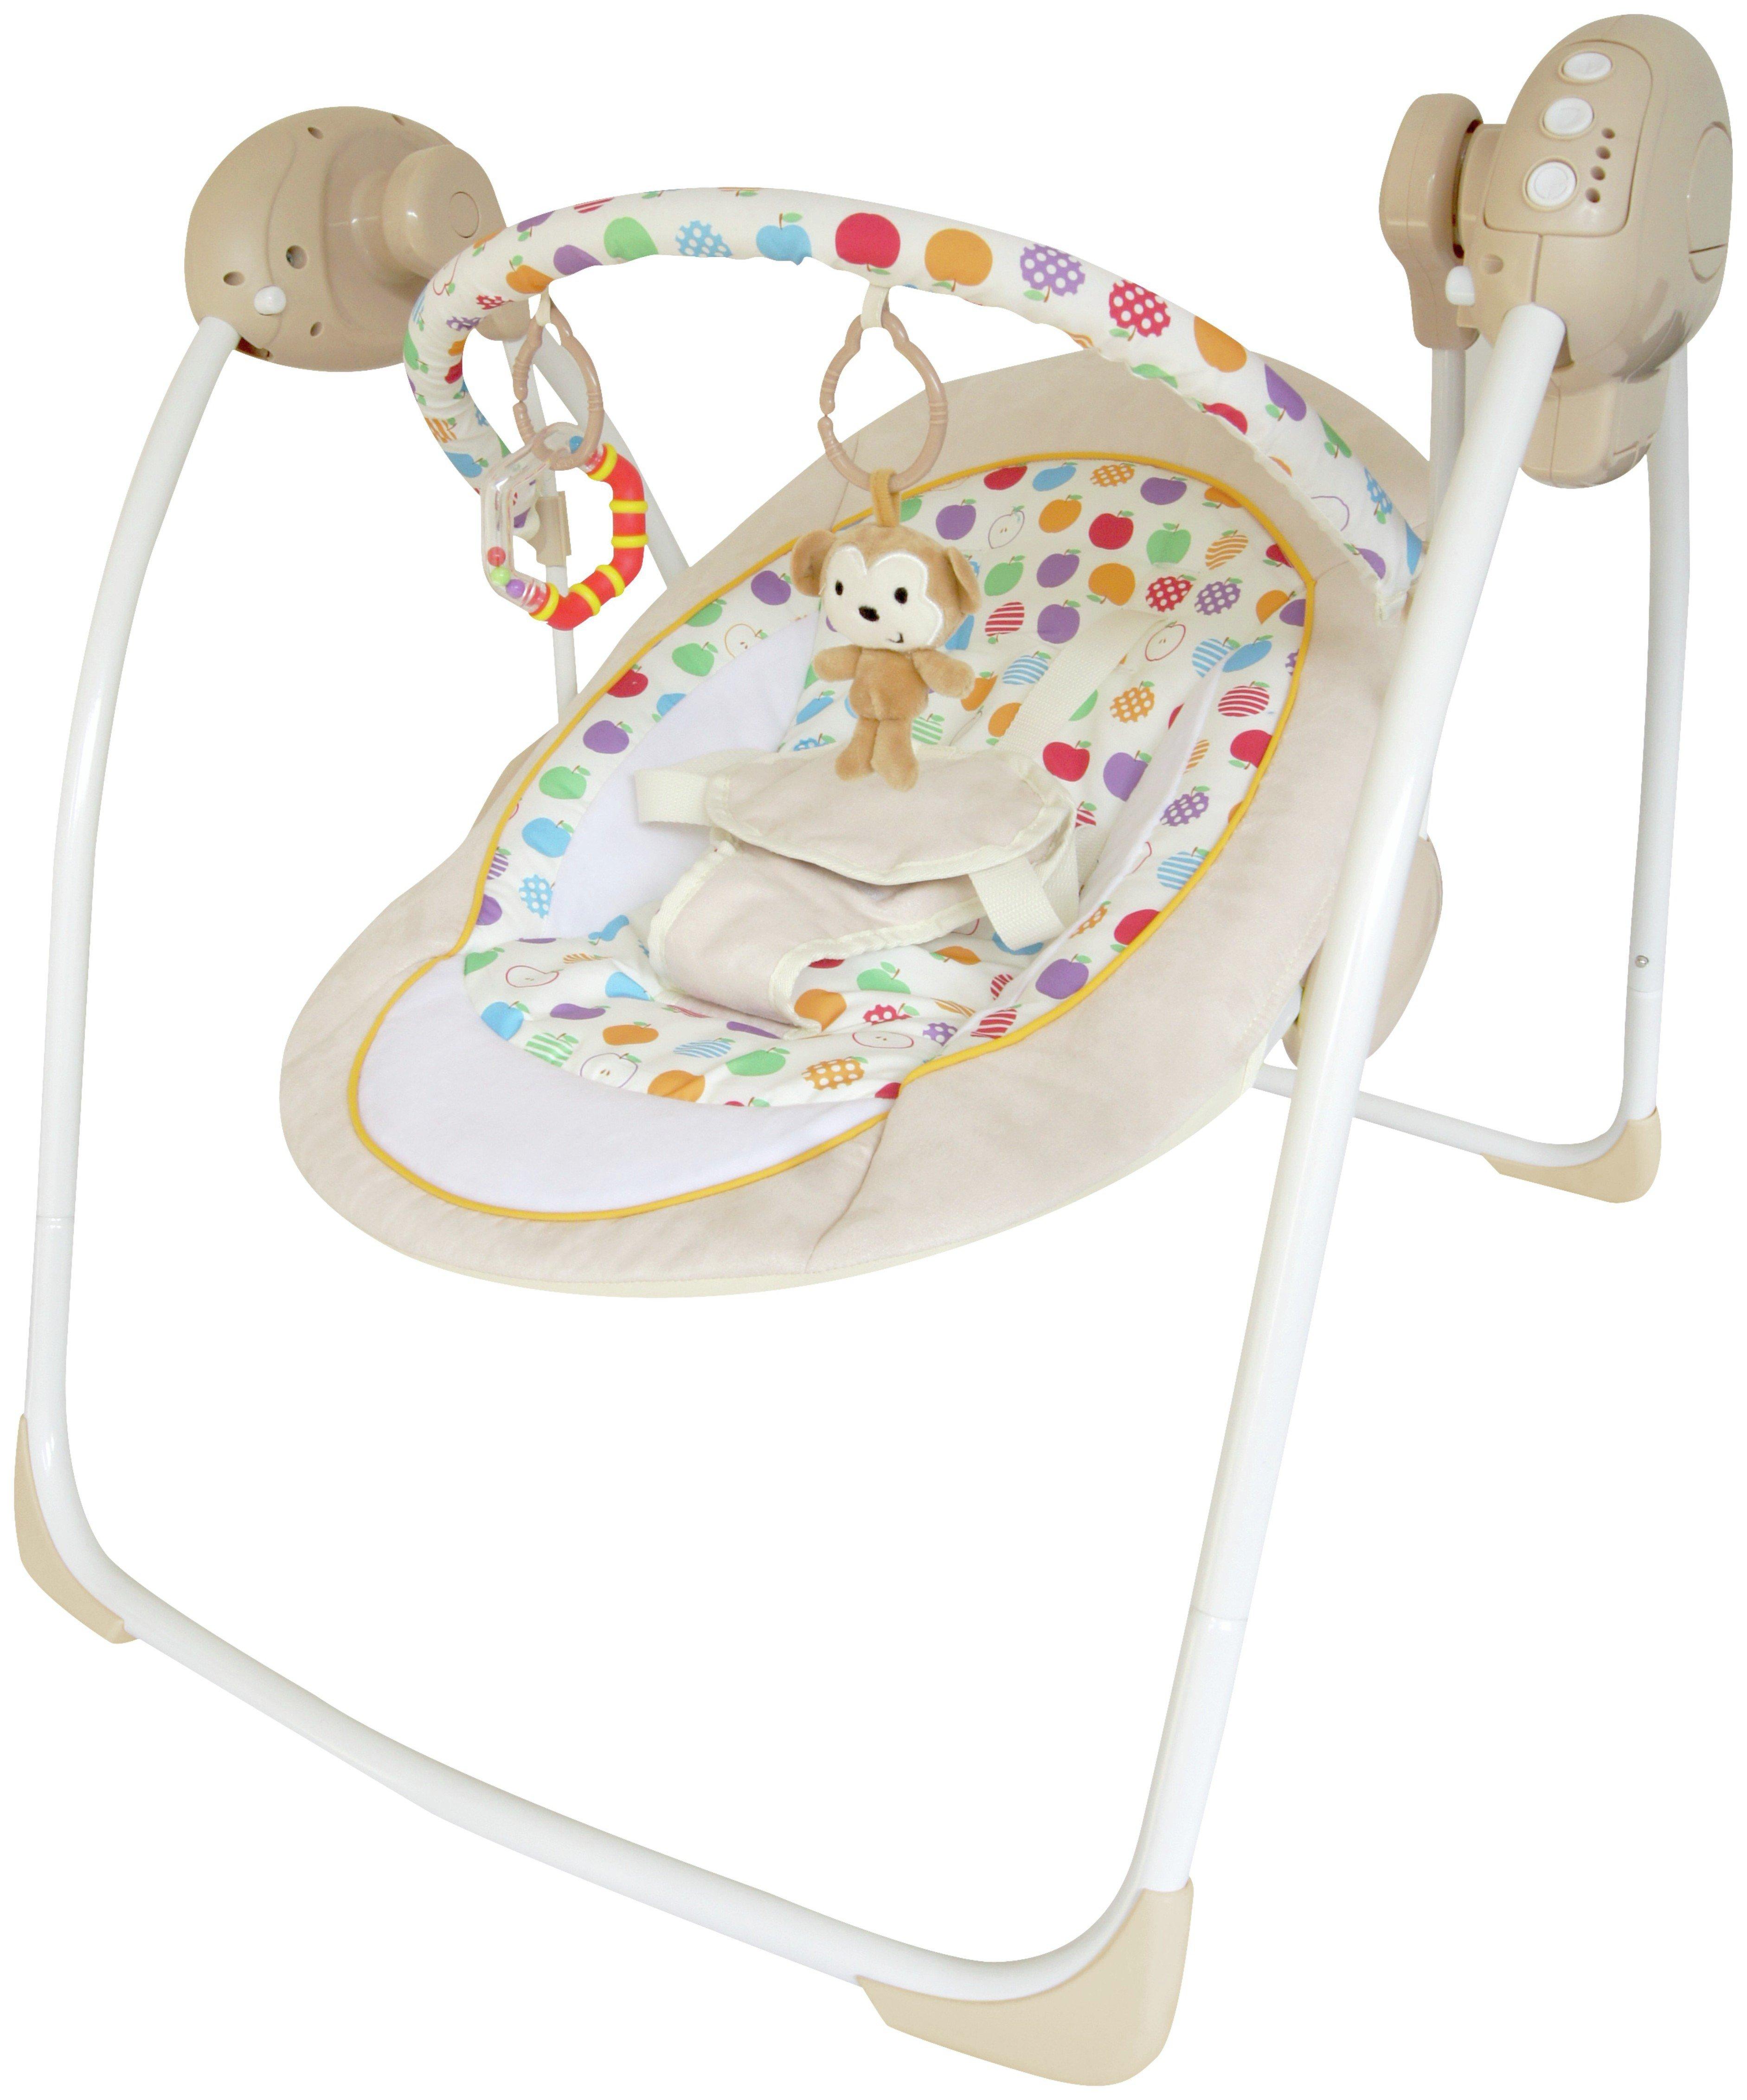 argos baby bouncer chair ergonomic ball office bebe style rocker cradling musical swing 54 99 octer